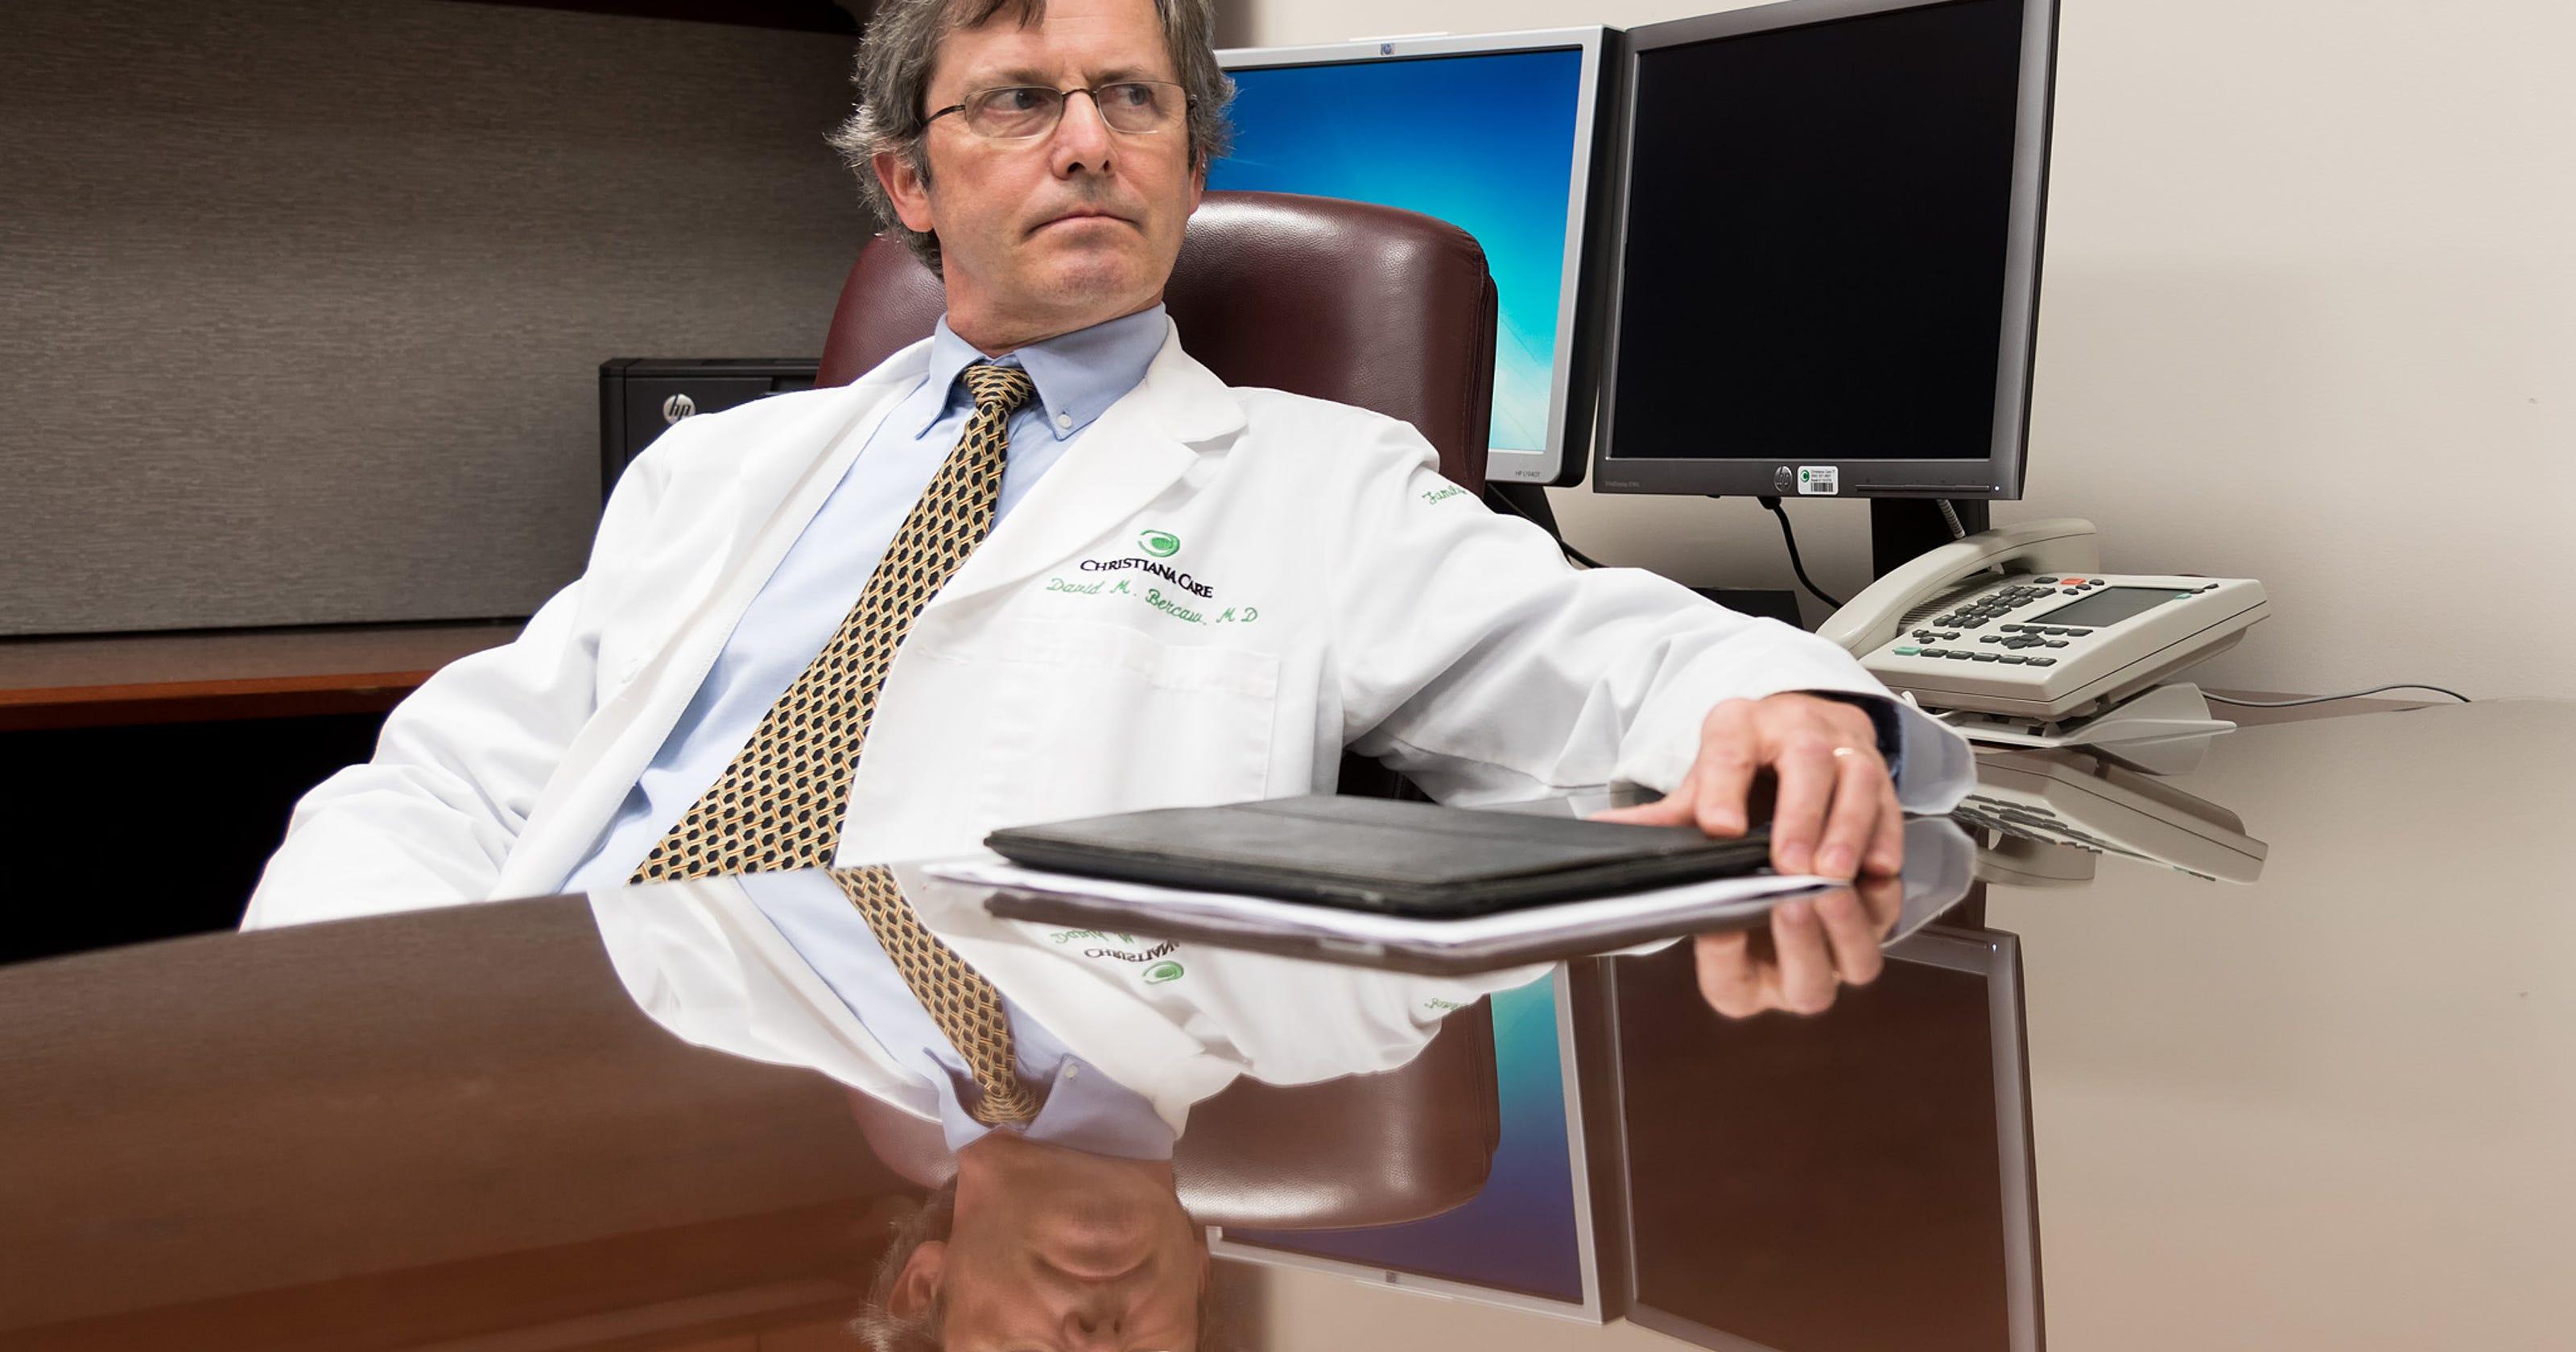 Delaware medical school pipeline at risk